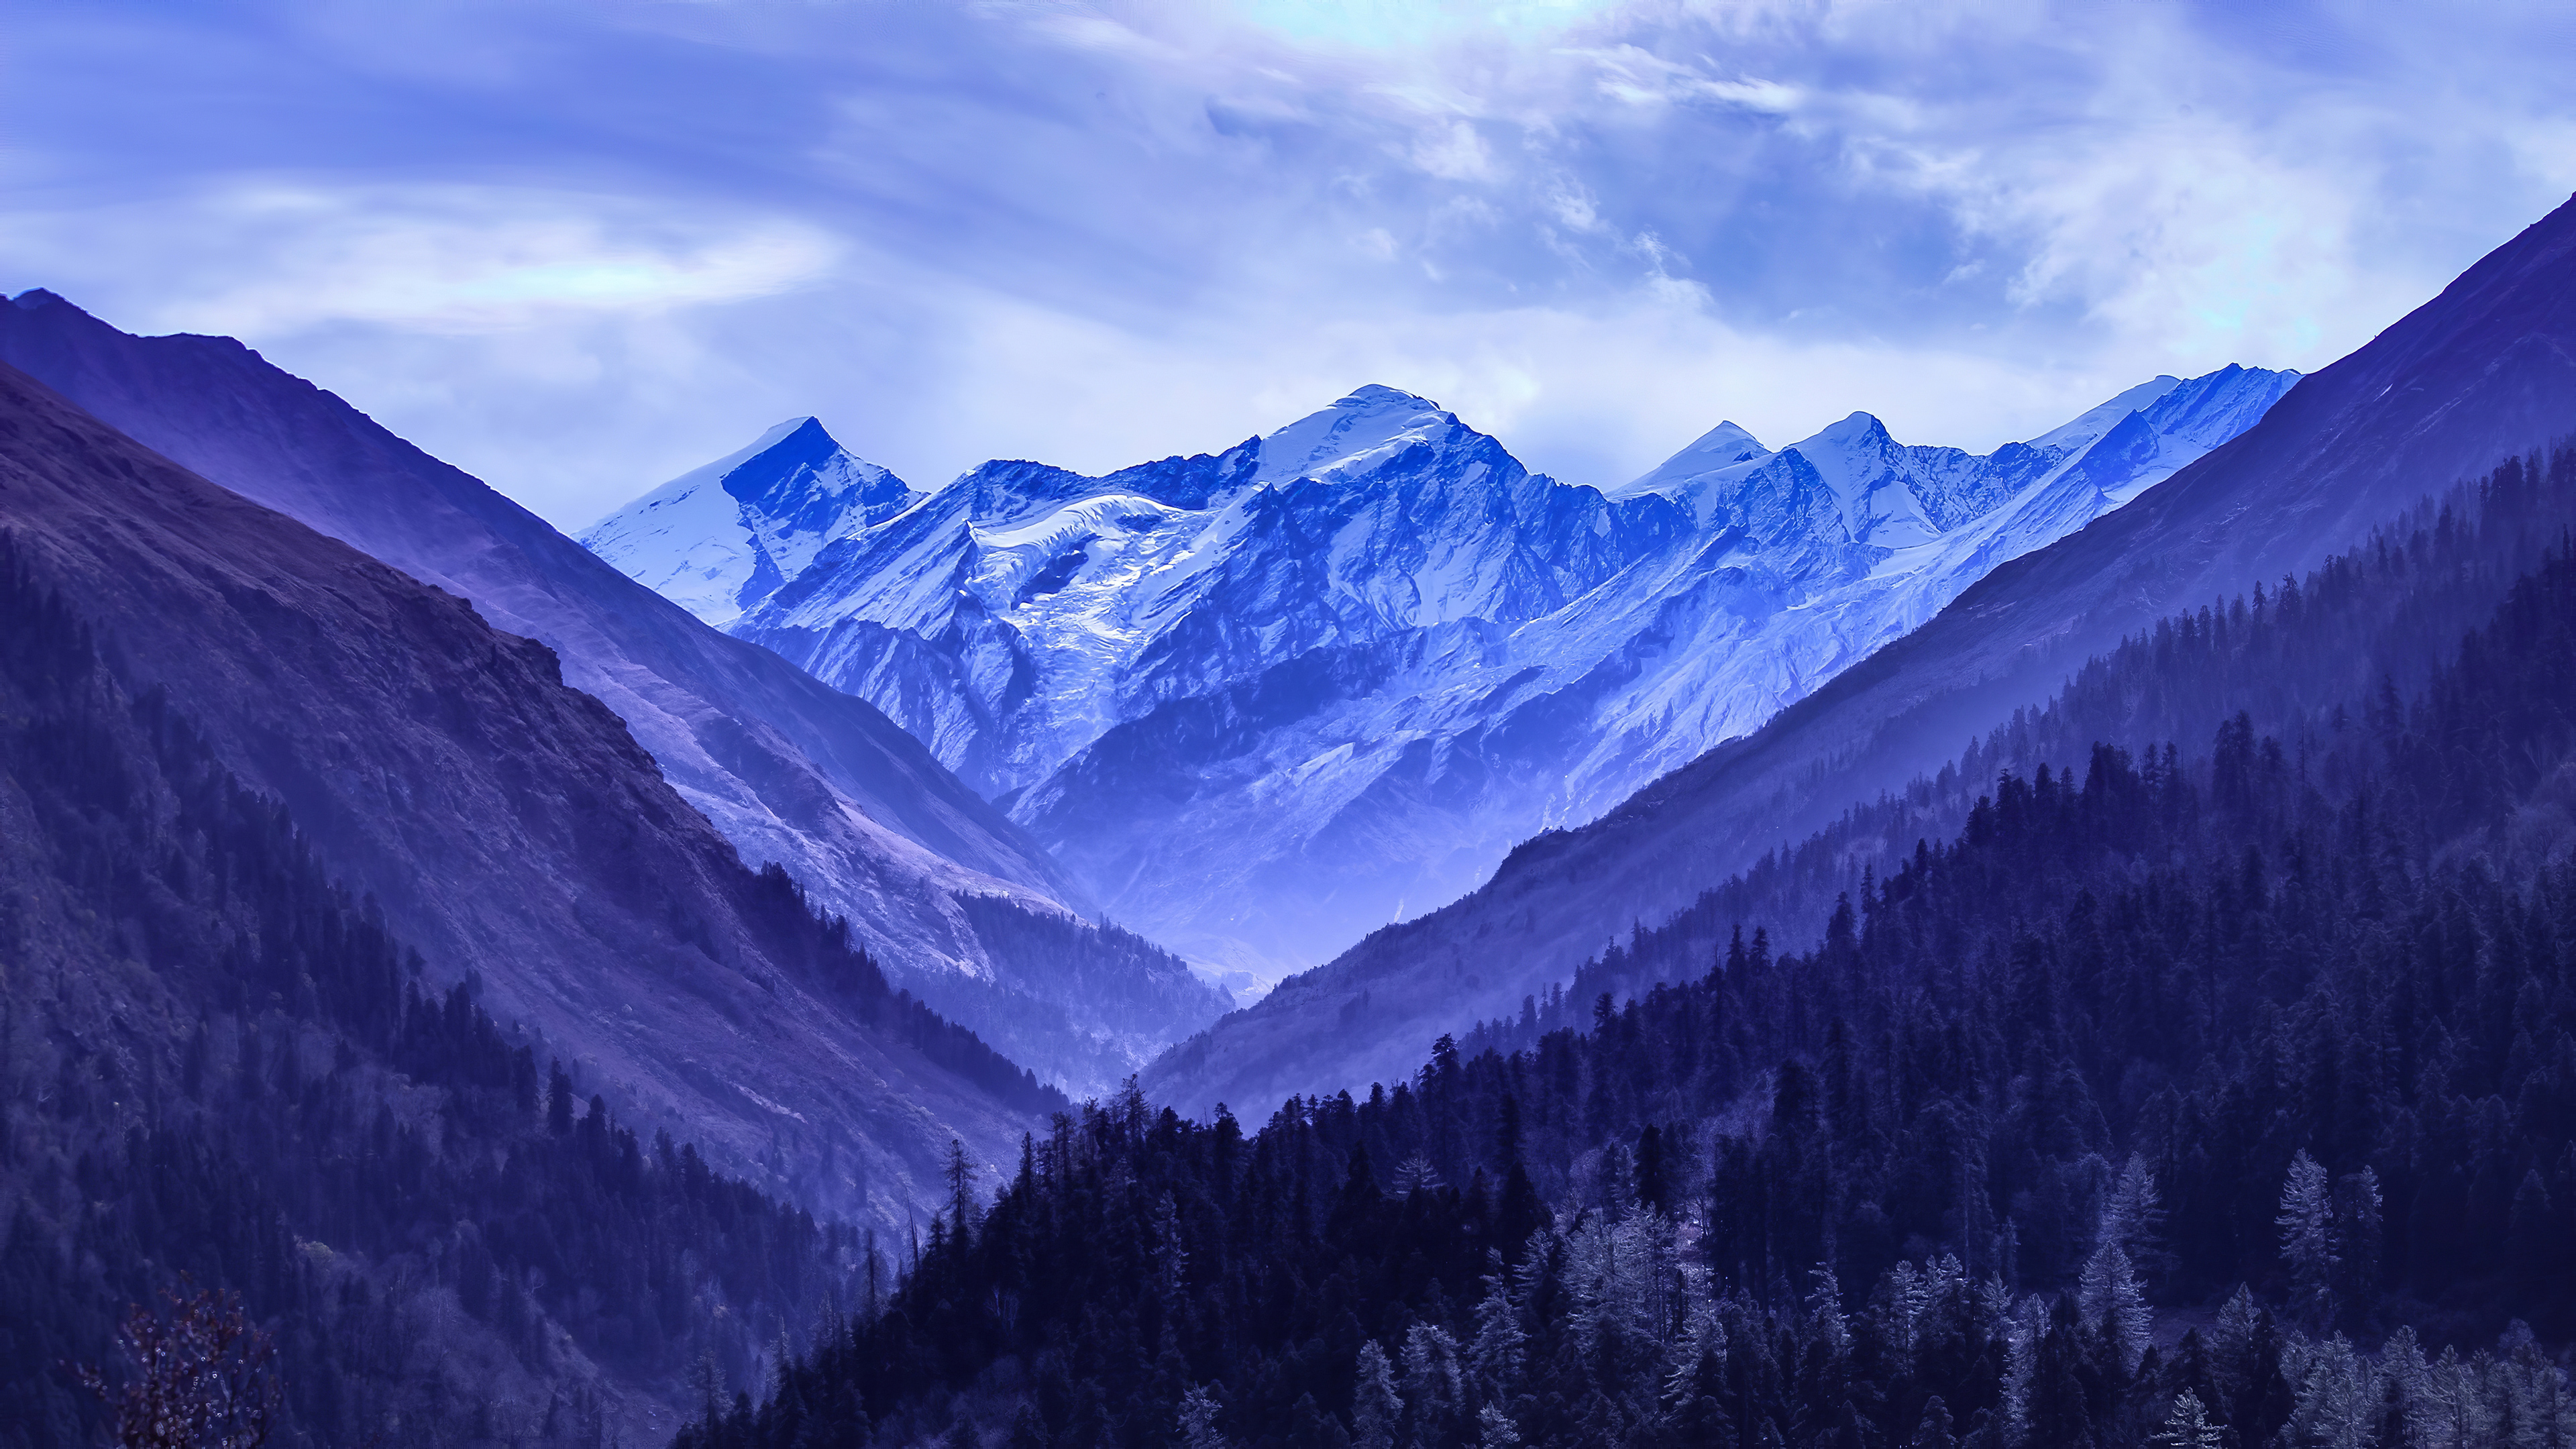 snowy blue mountains 1574939655 - Snowy Blue Mountains -